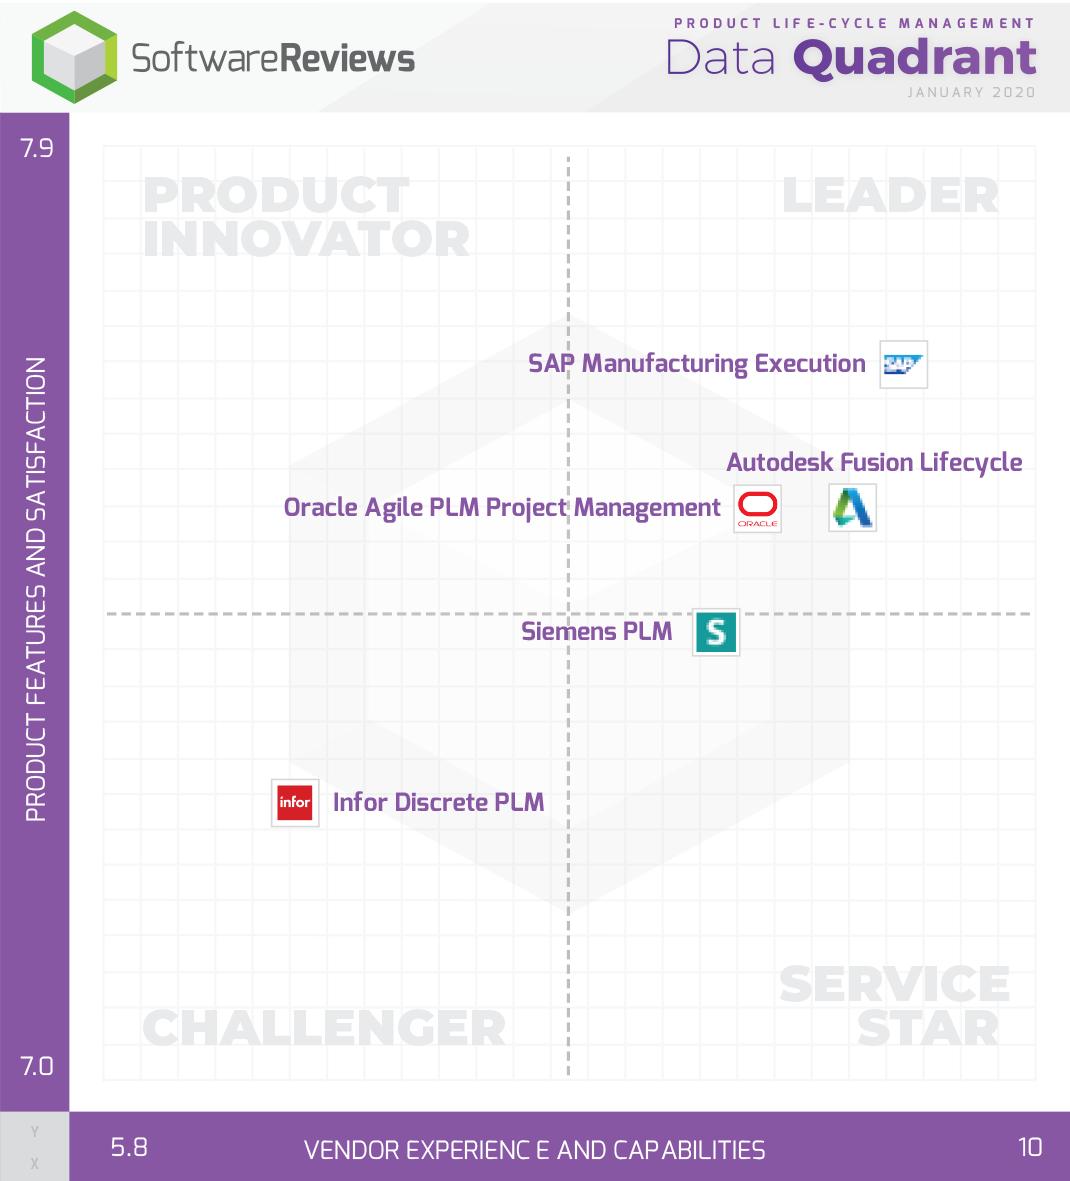 Product Life-Cycle Management Data Quadrant